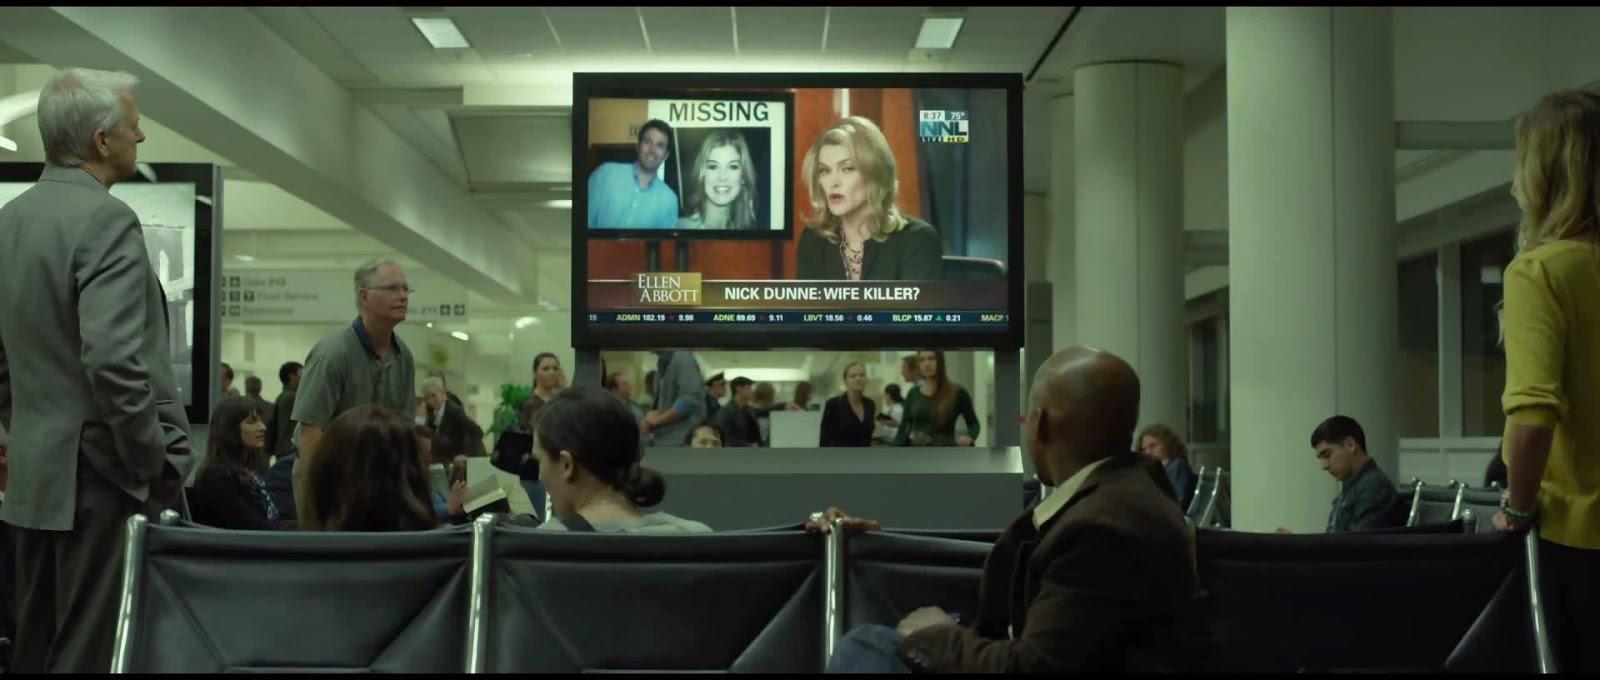 GONE GIRL Movie HD Trailer Captures00023_1_1.jpg